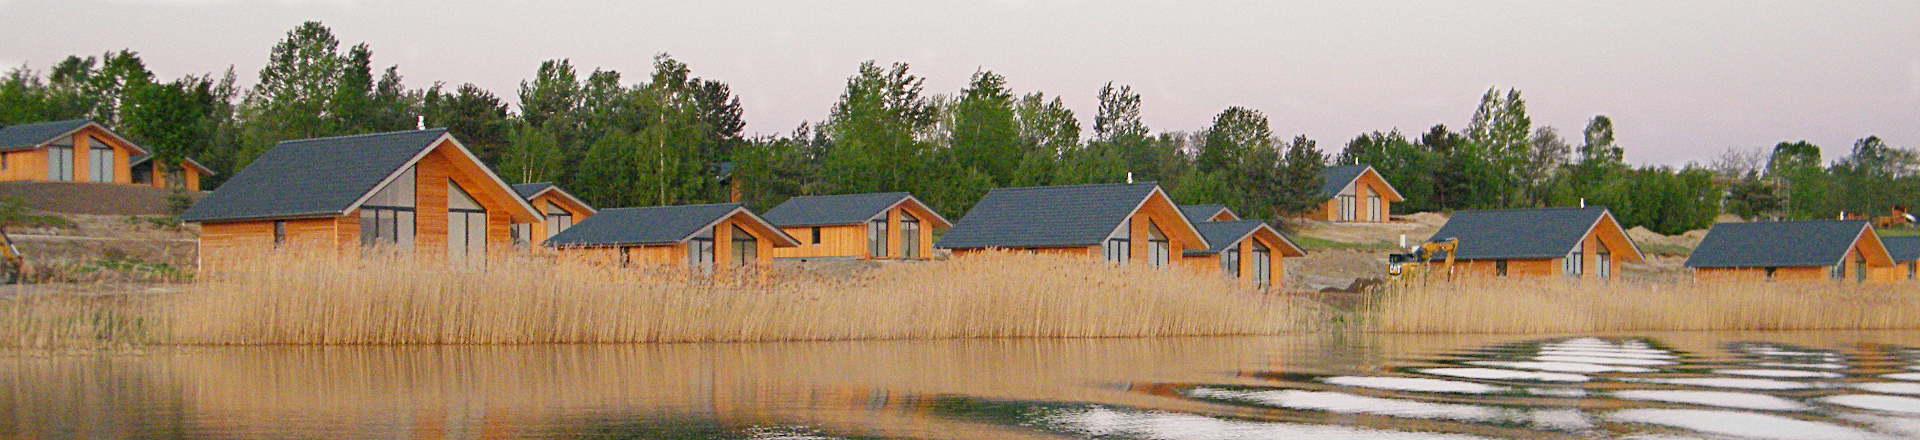 Ferienhäuser am See Gröbern